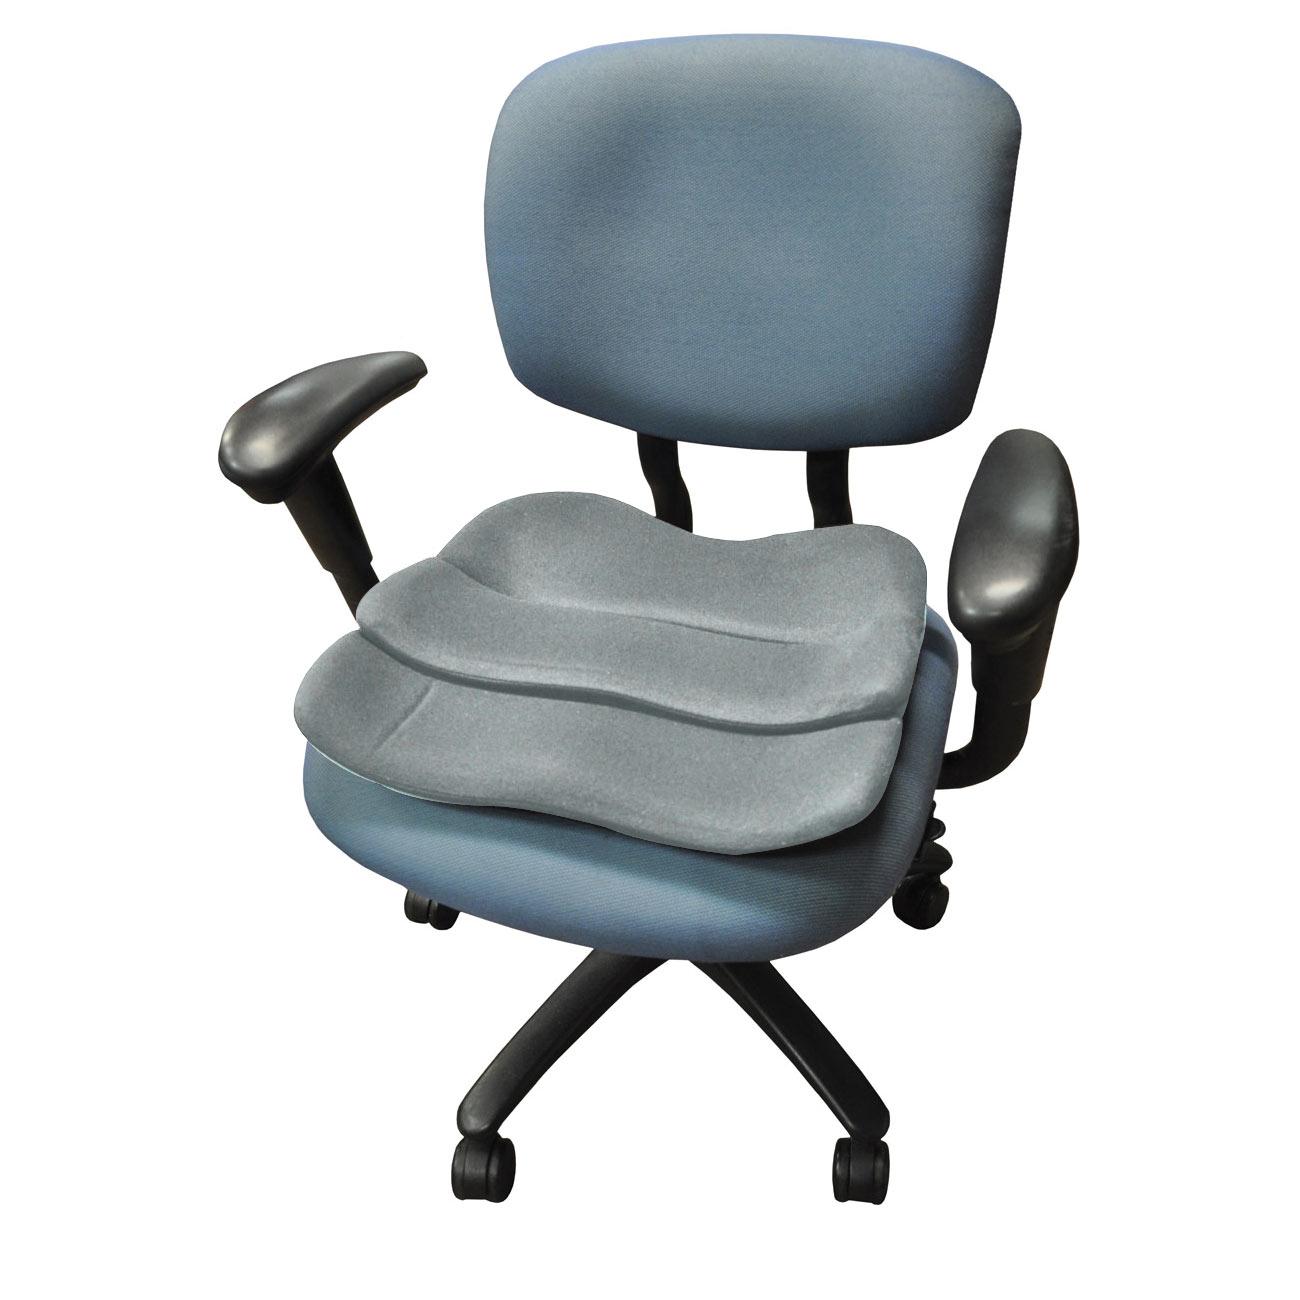 ObusForme Contoured Seat Cushion - Gray